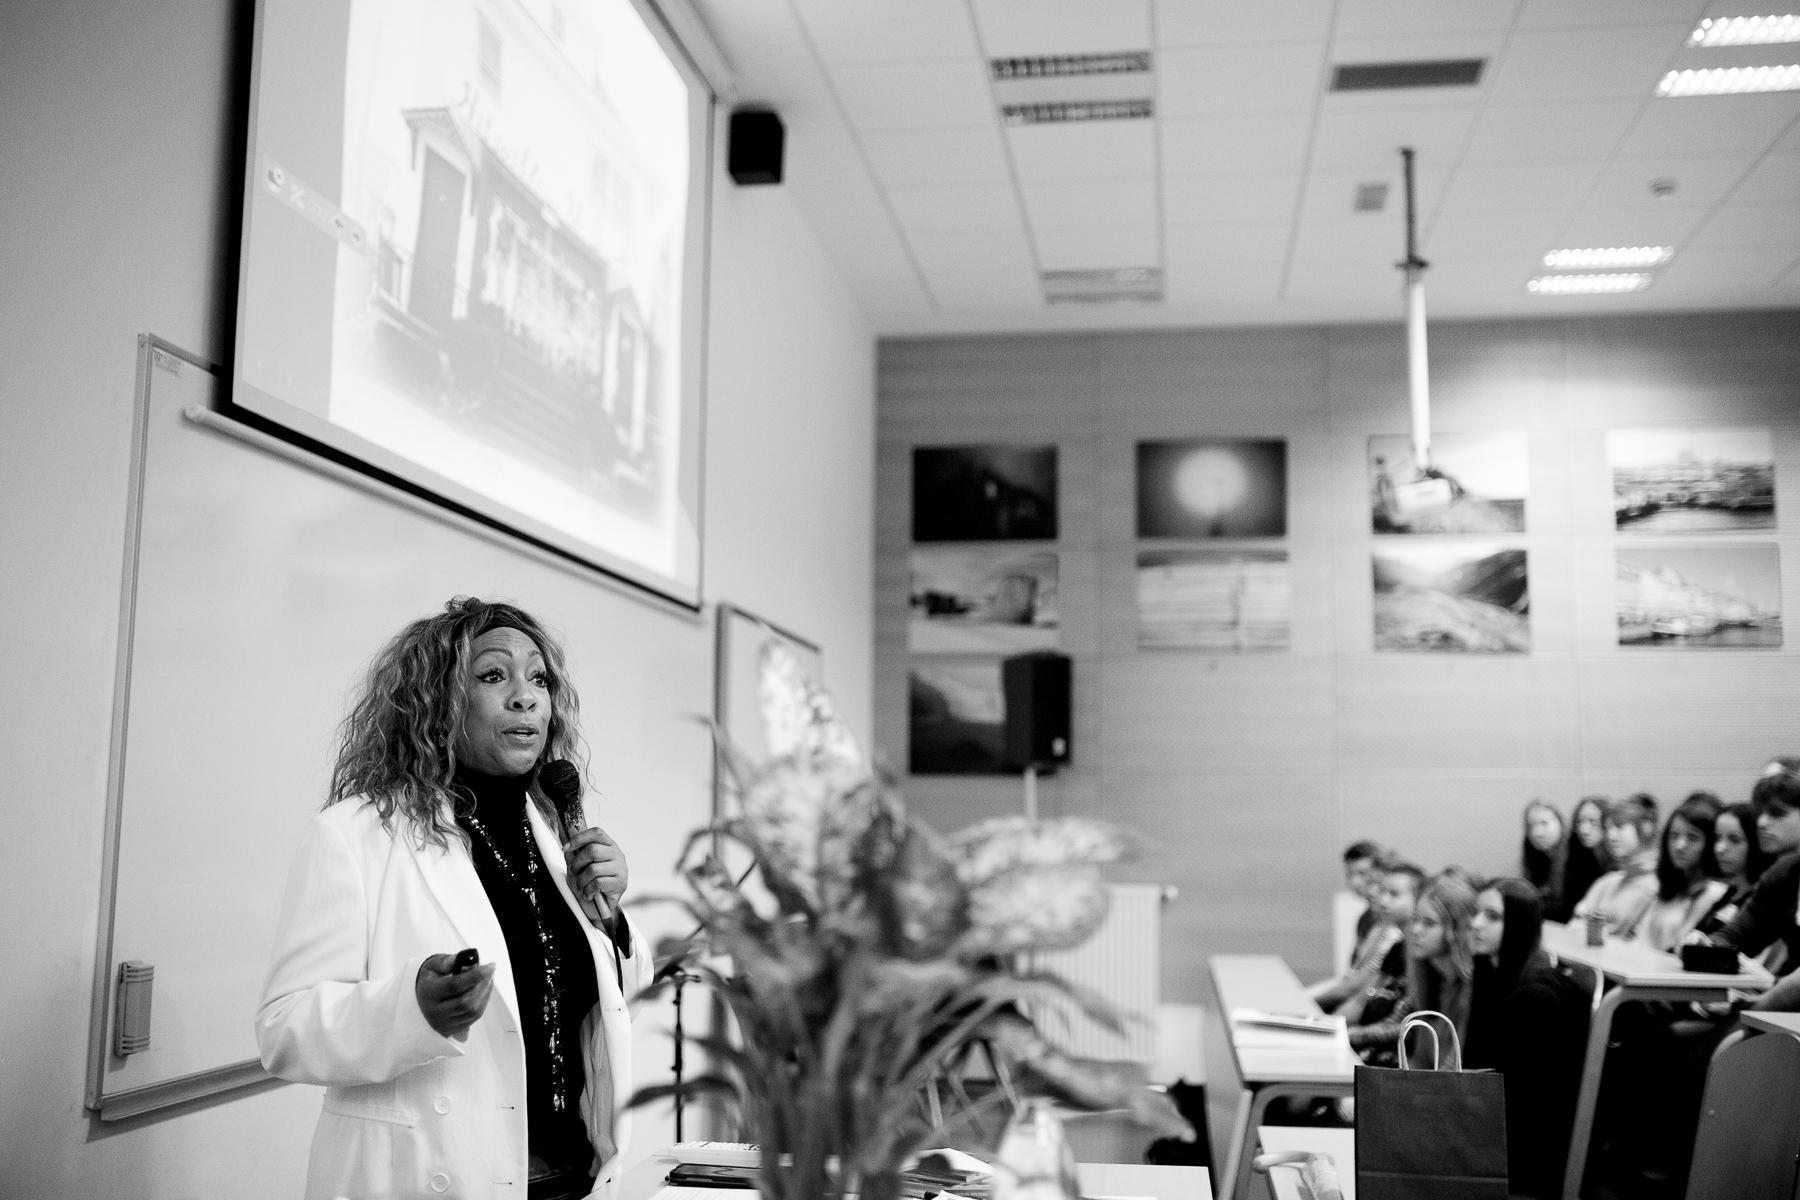 Mary Wilson of the Supremes talks to high school students of Šentvid high school in Ljubljana, Slovenia, February 4, 2020.